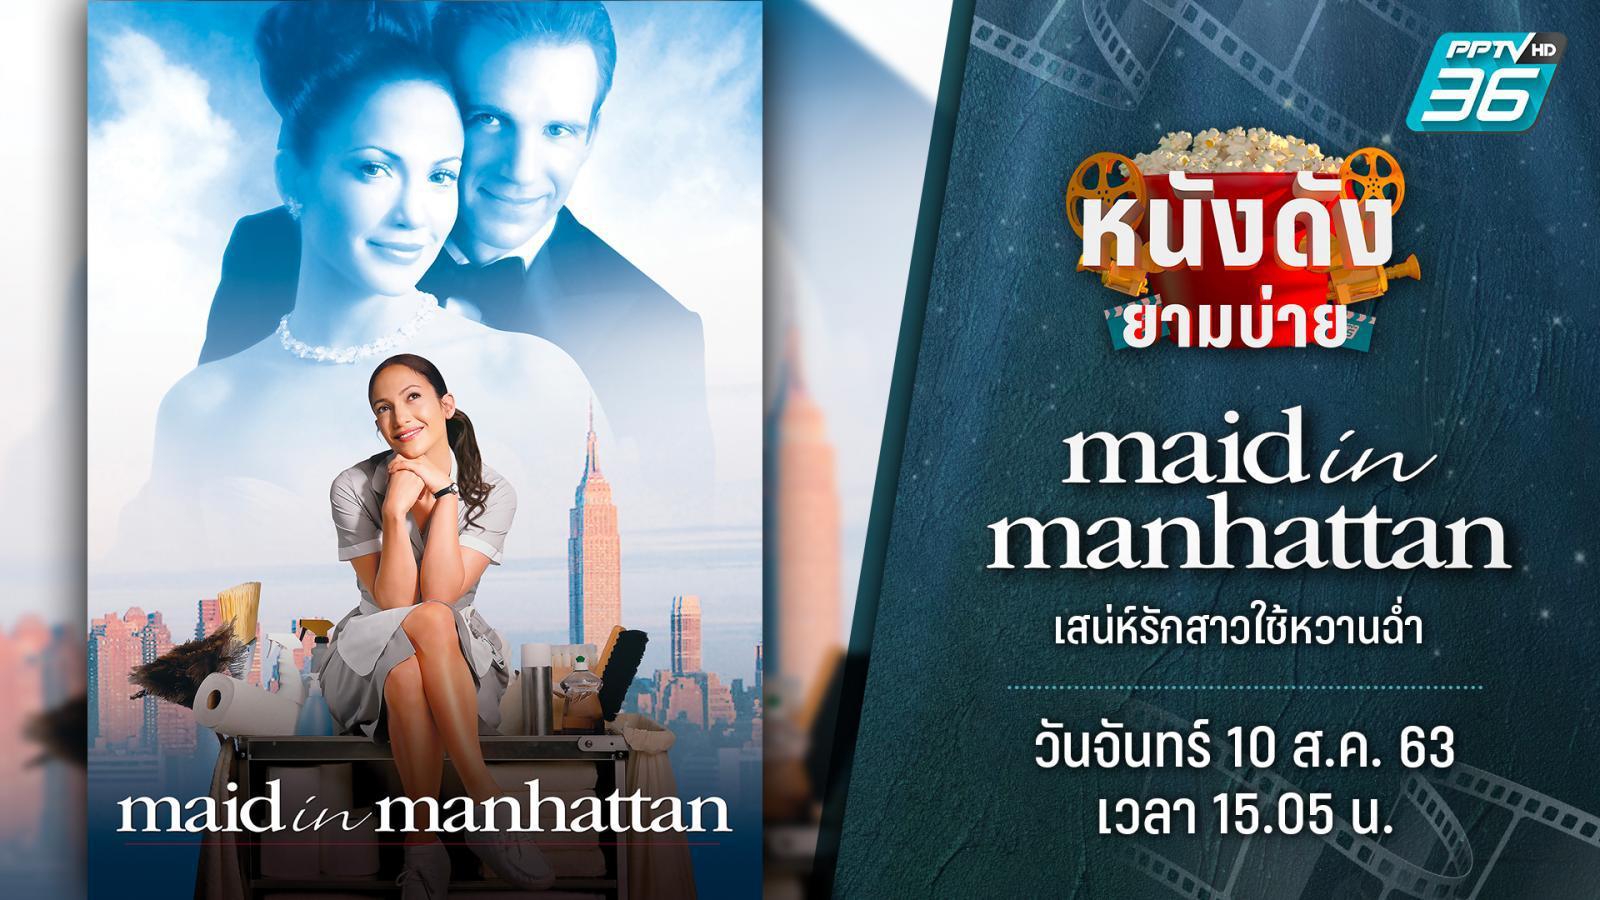 Maid In Manhattan เสน่ห์รักสาวใช้หวานฉ่ำ